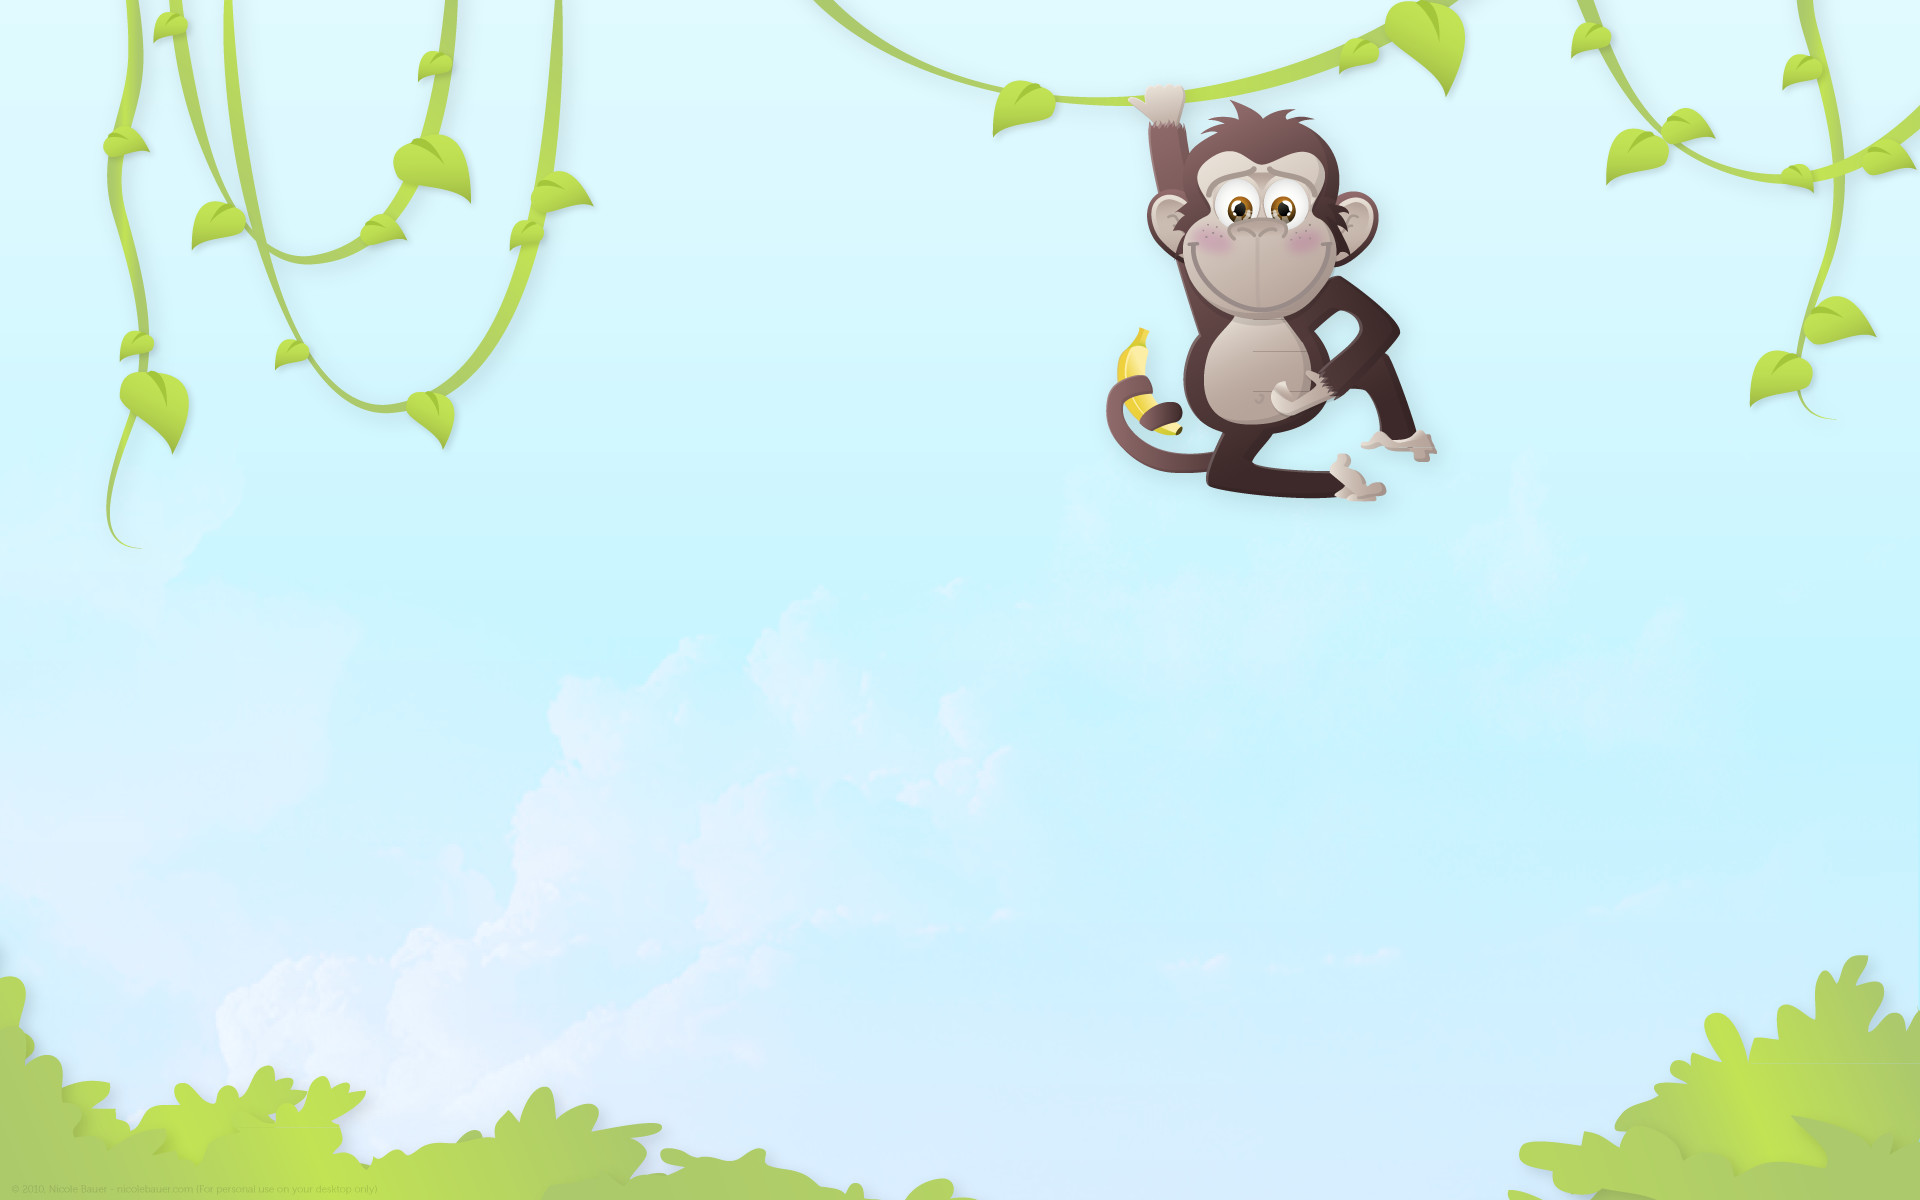 Free Monkey Wallpapers Wallpaper | HD Wallpapers | Pinterest | Monkey  wallpaper and Wallpaper